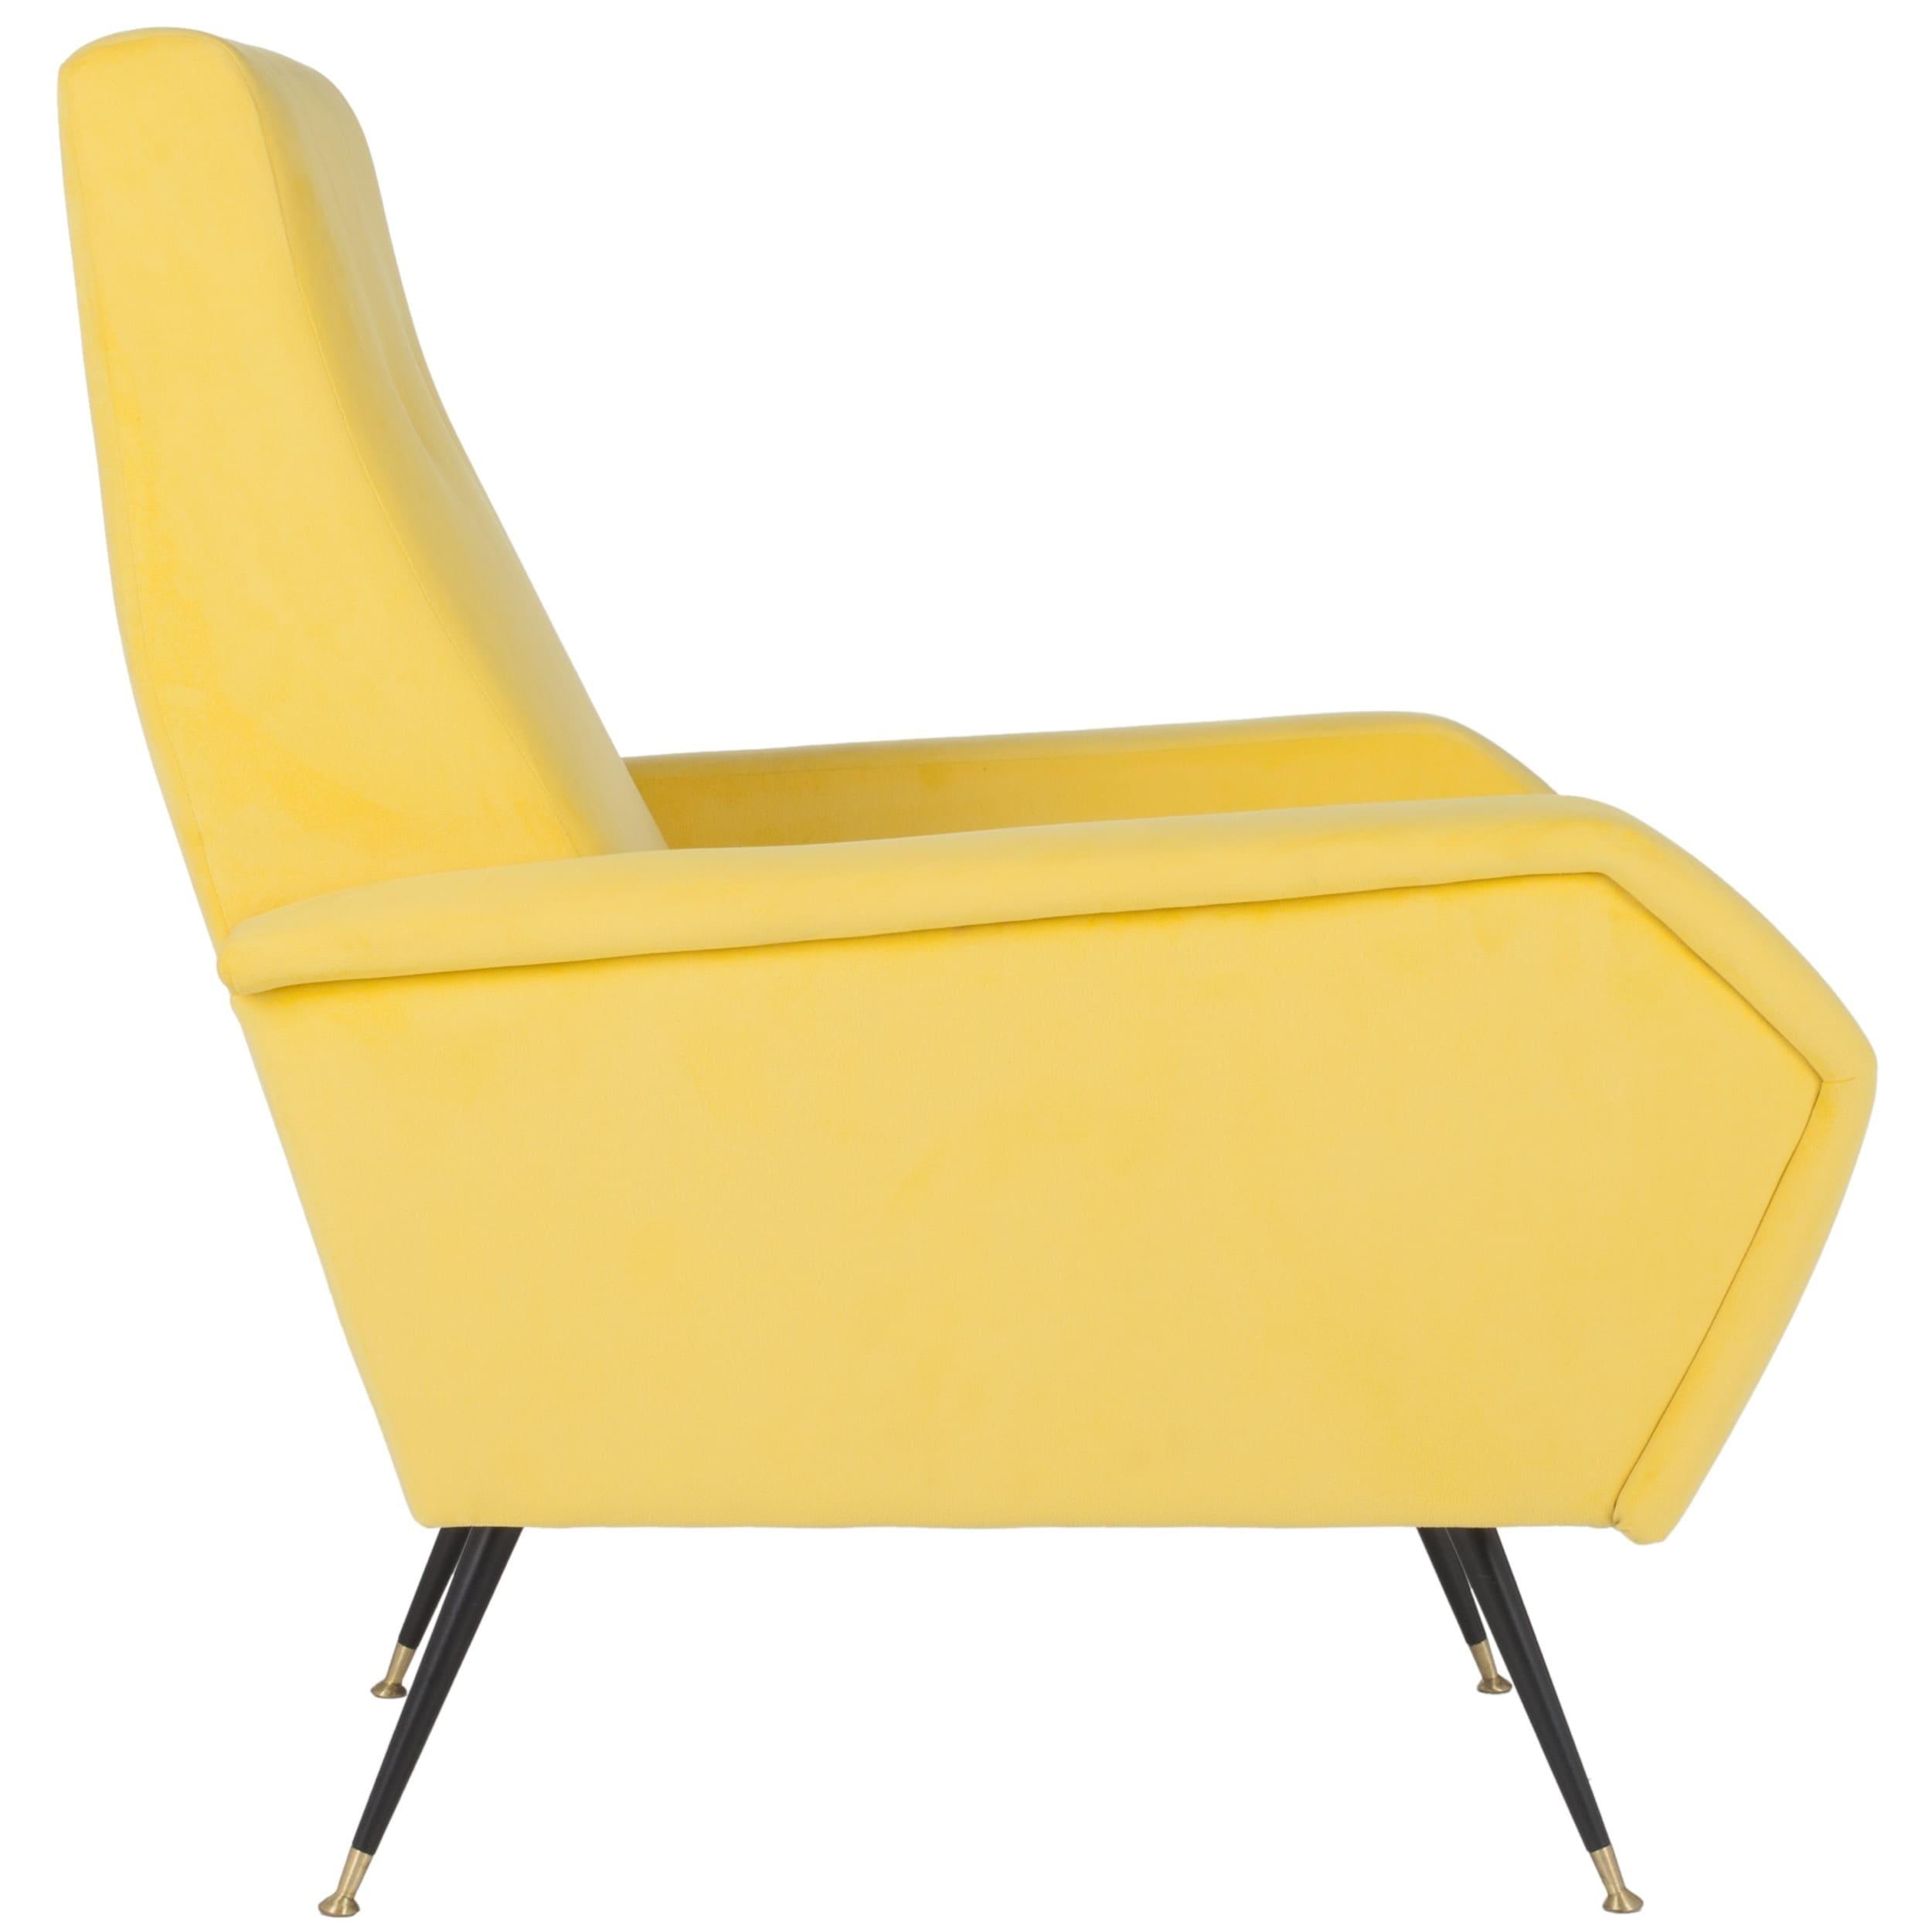 Charmant Shop Safavieh Mid Century Modern Retro Aida Velvet Yellow Club Chair   On  Sale   Free Shipping Today   Overstock.com   13341777